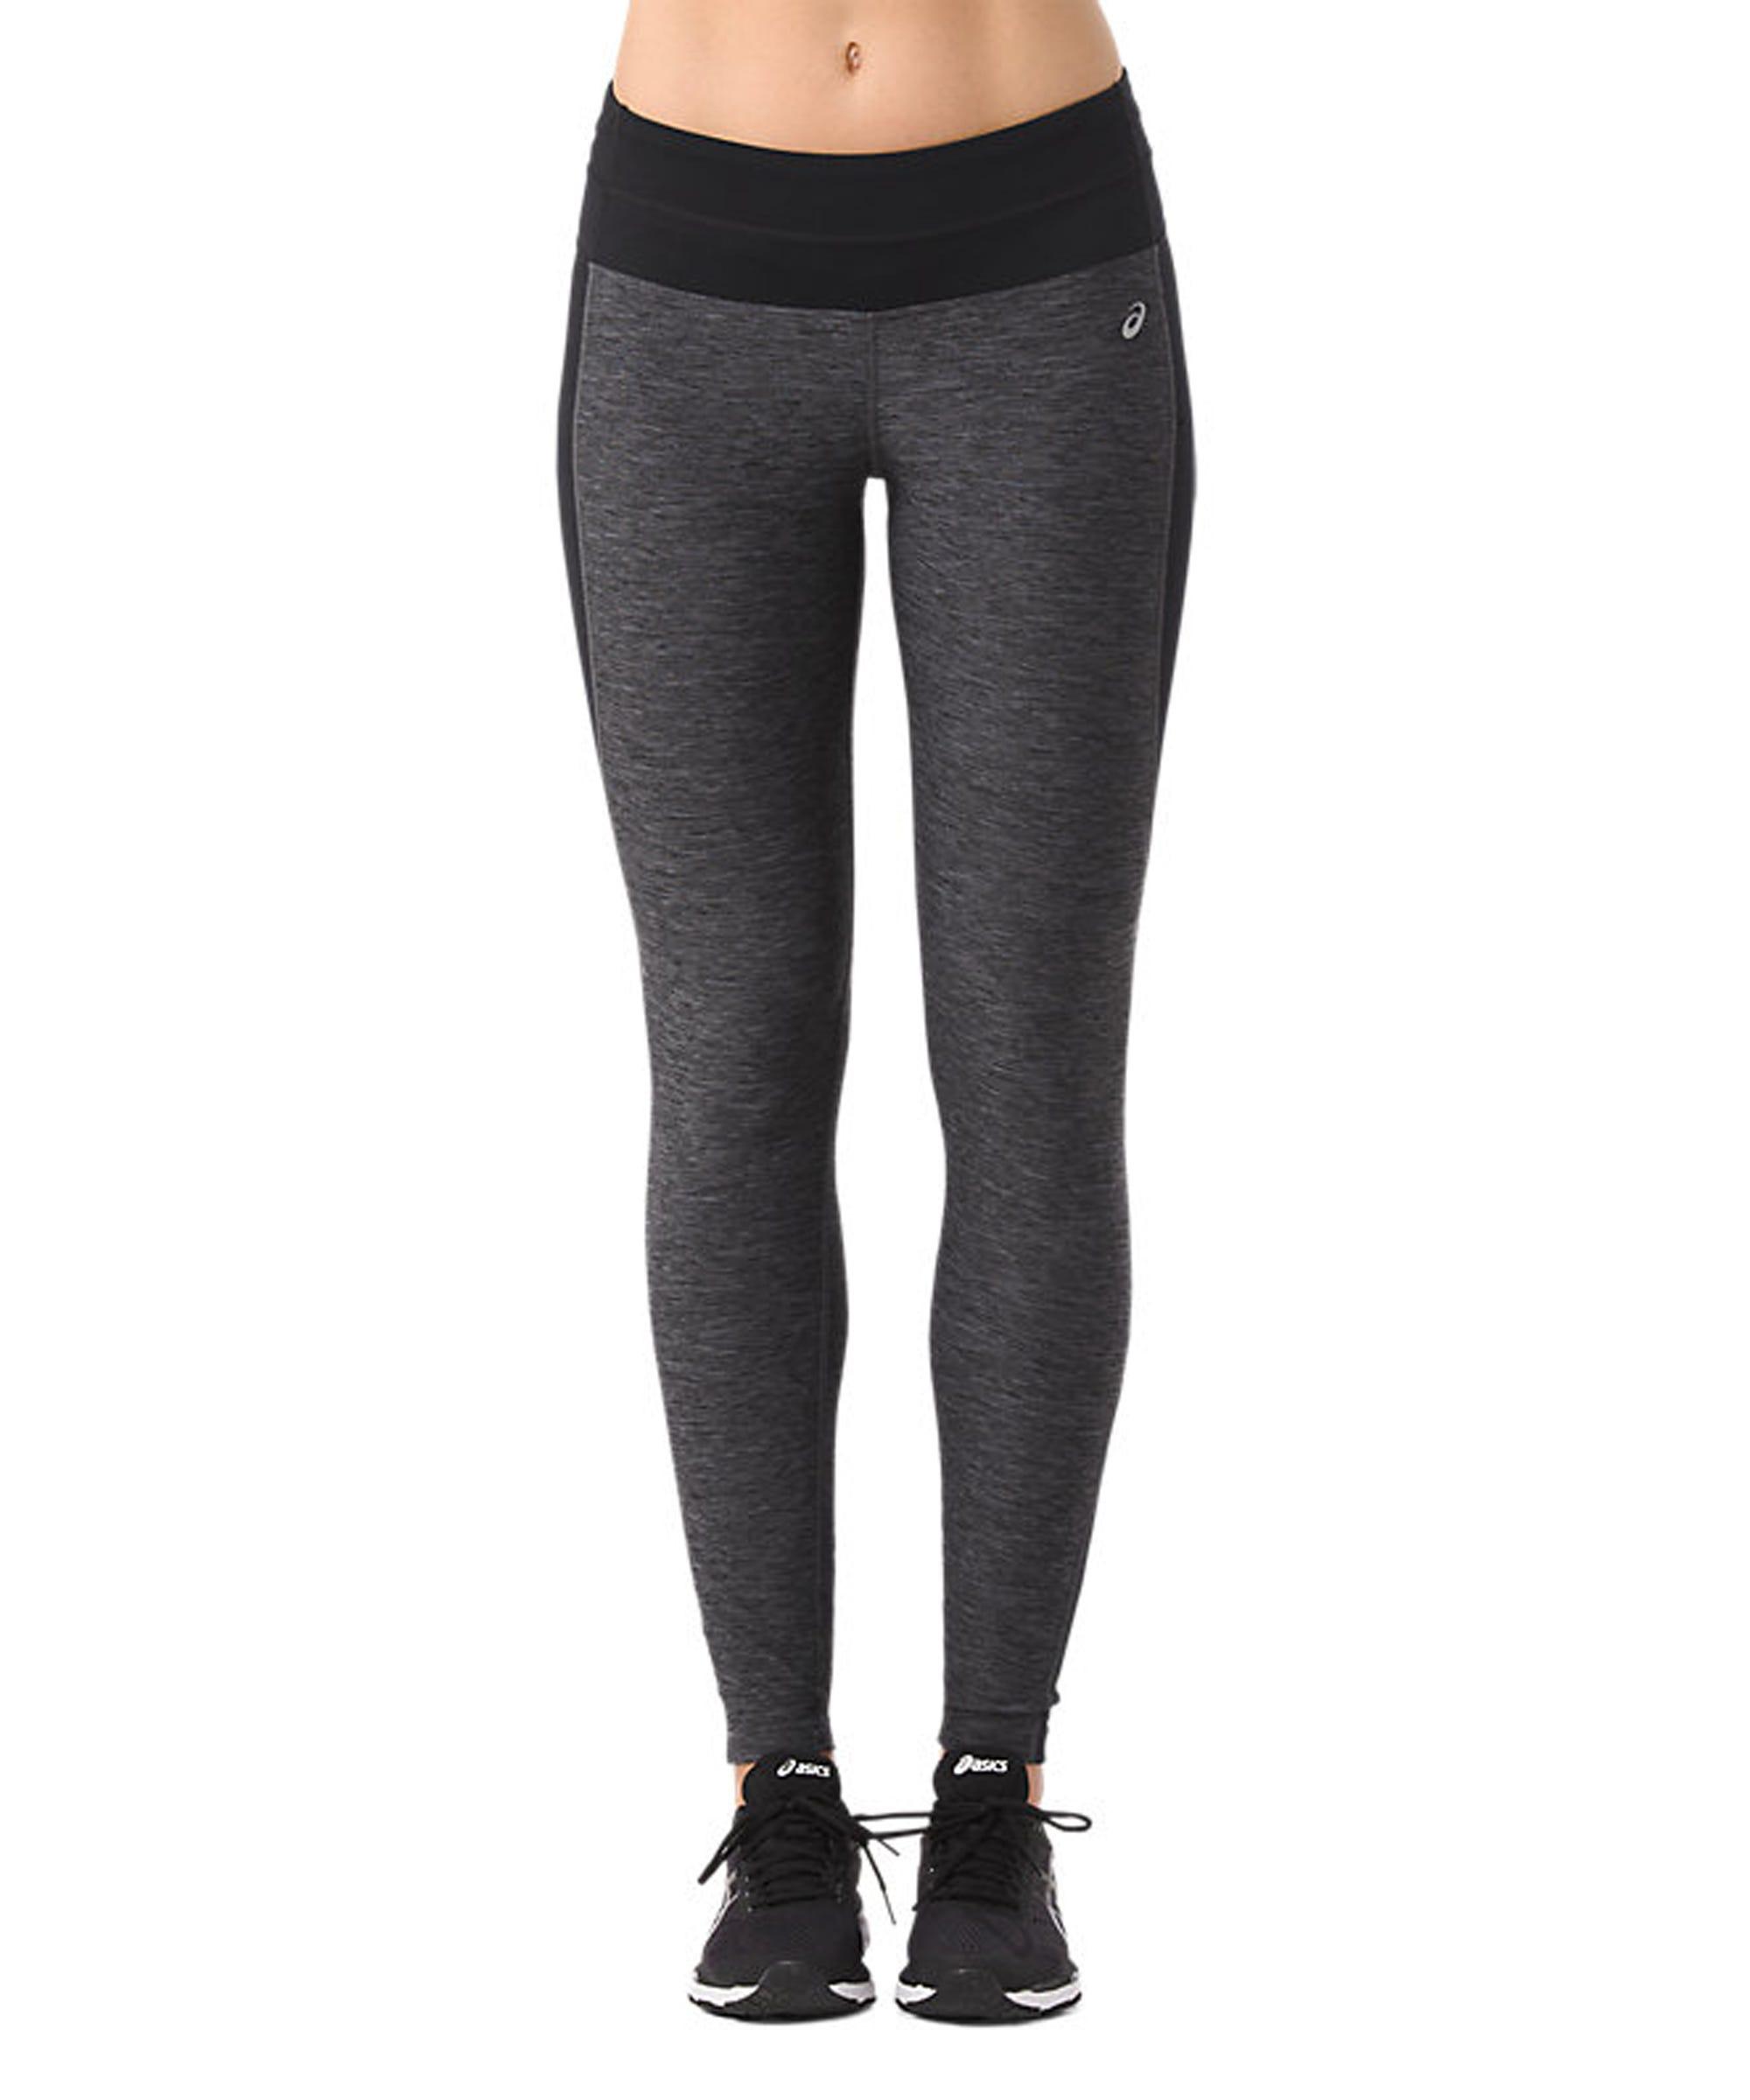 bfc6b9ea5e6a6 Best Warm Leggings For Winter Workouts Clothes, Women